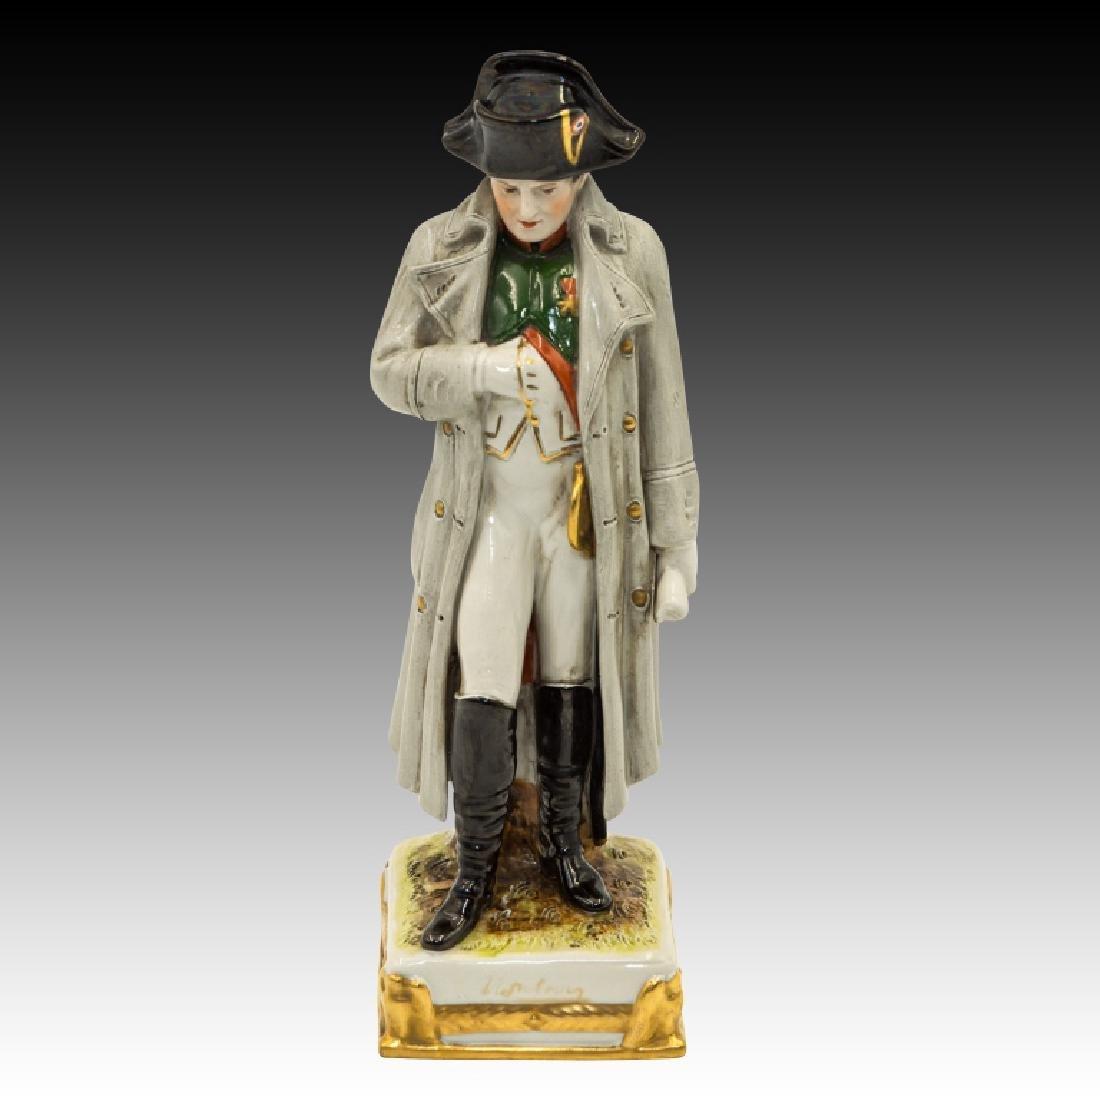 2 Figurines Napoleon and Ticouette - 6